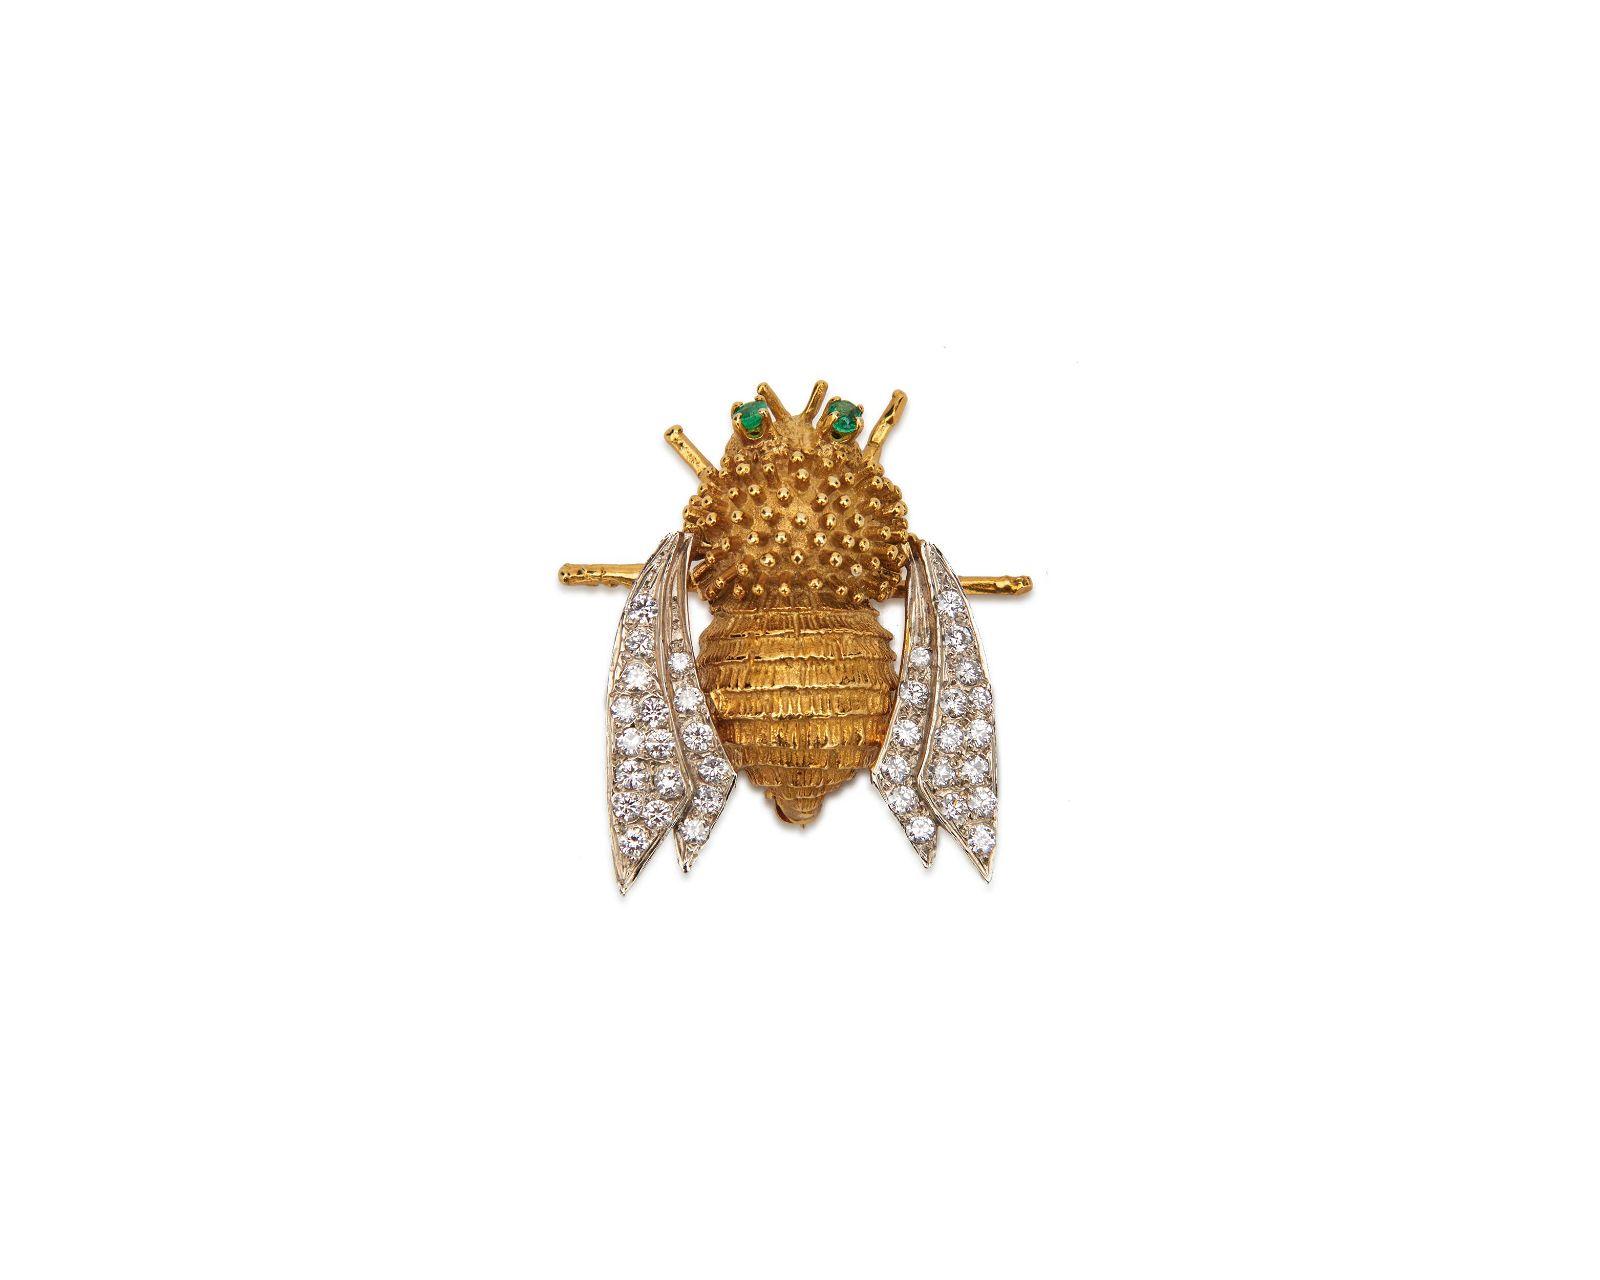 14K Gold, Diamond, and Emerald Bee Brooch